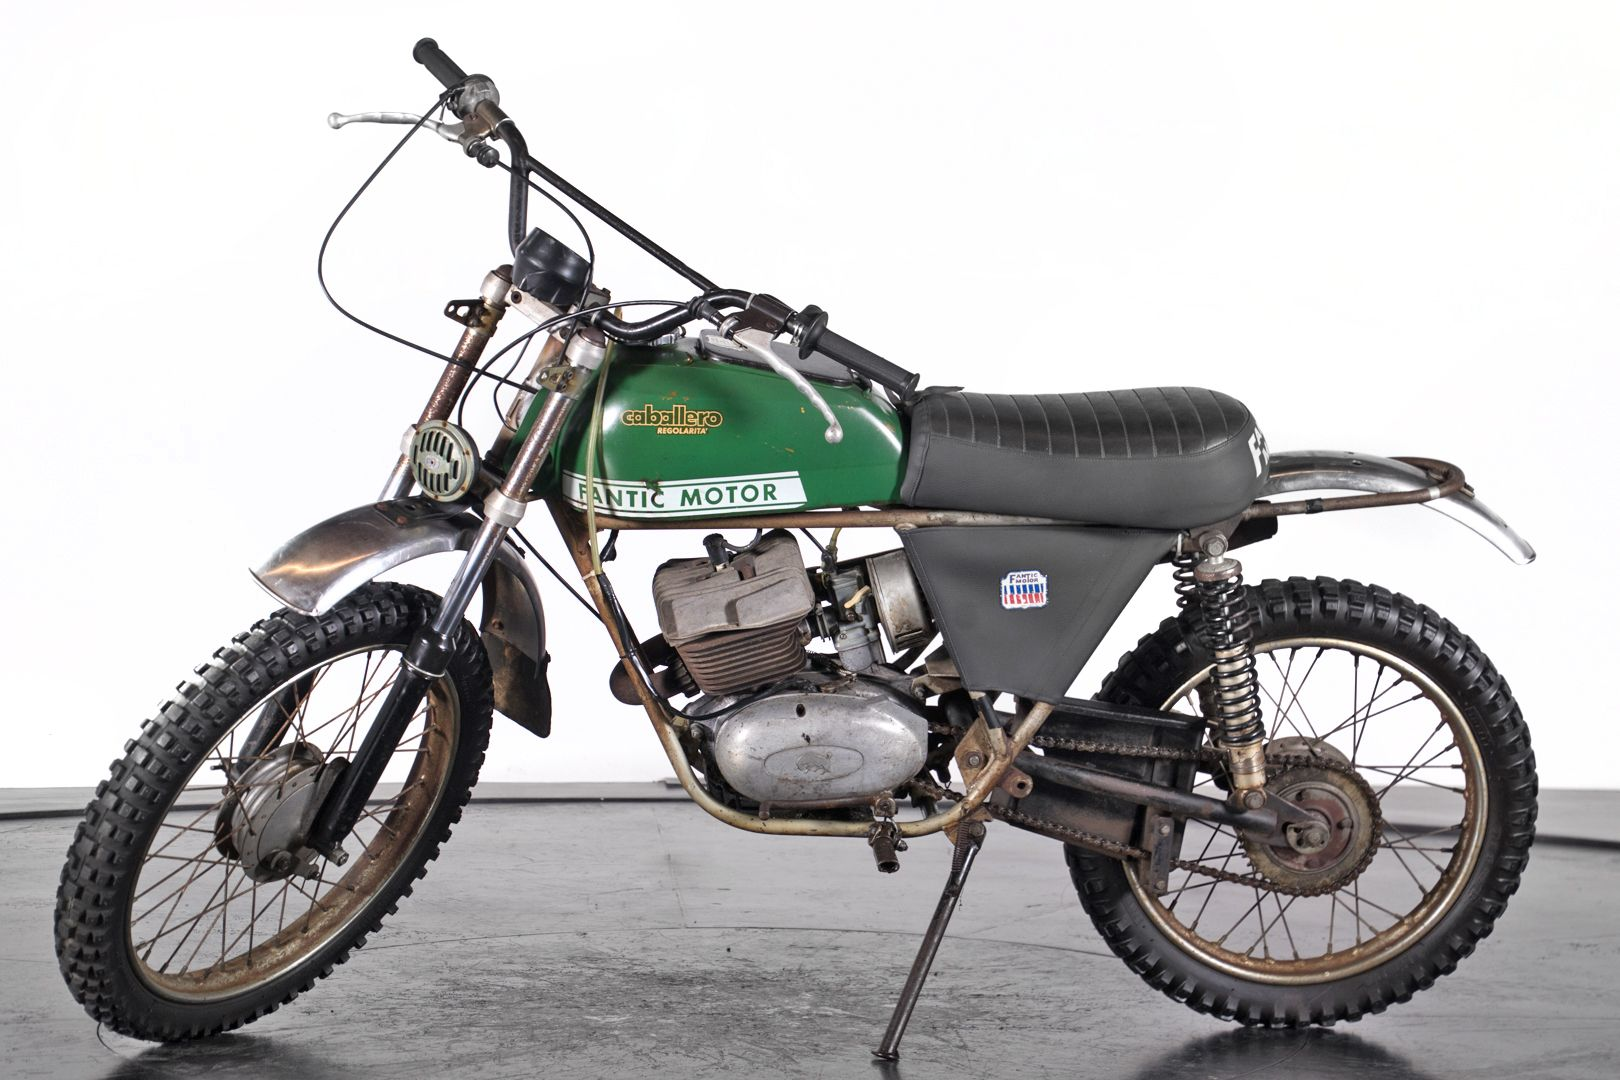 1971 FANTIC MOTOR CABALLERO 100 CROSS TX92 53135